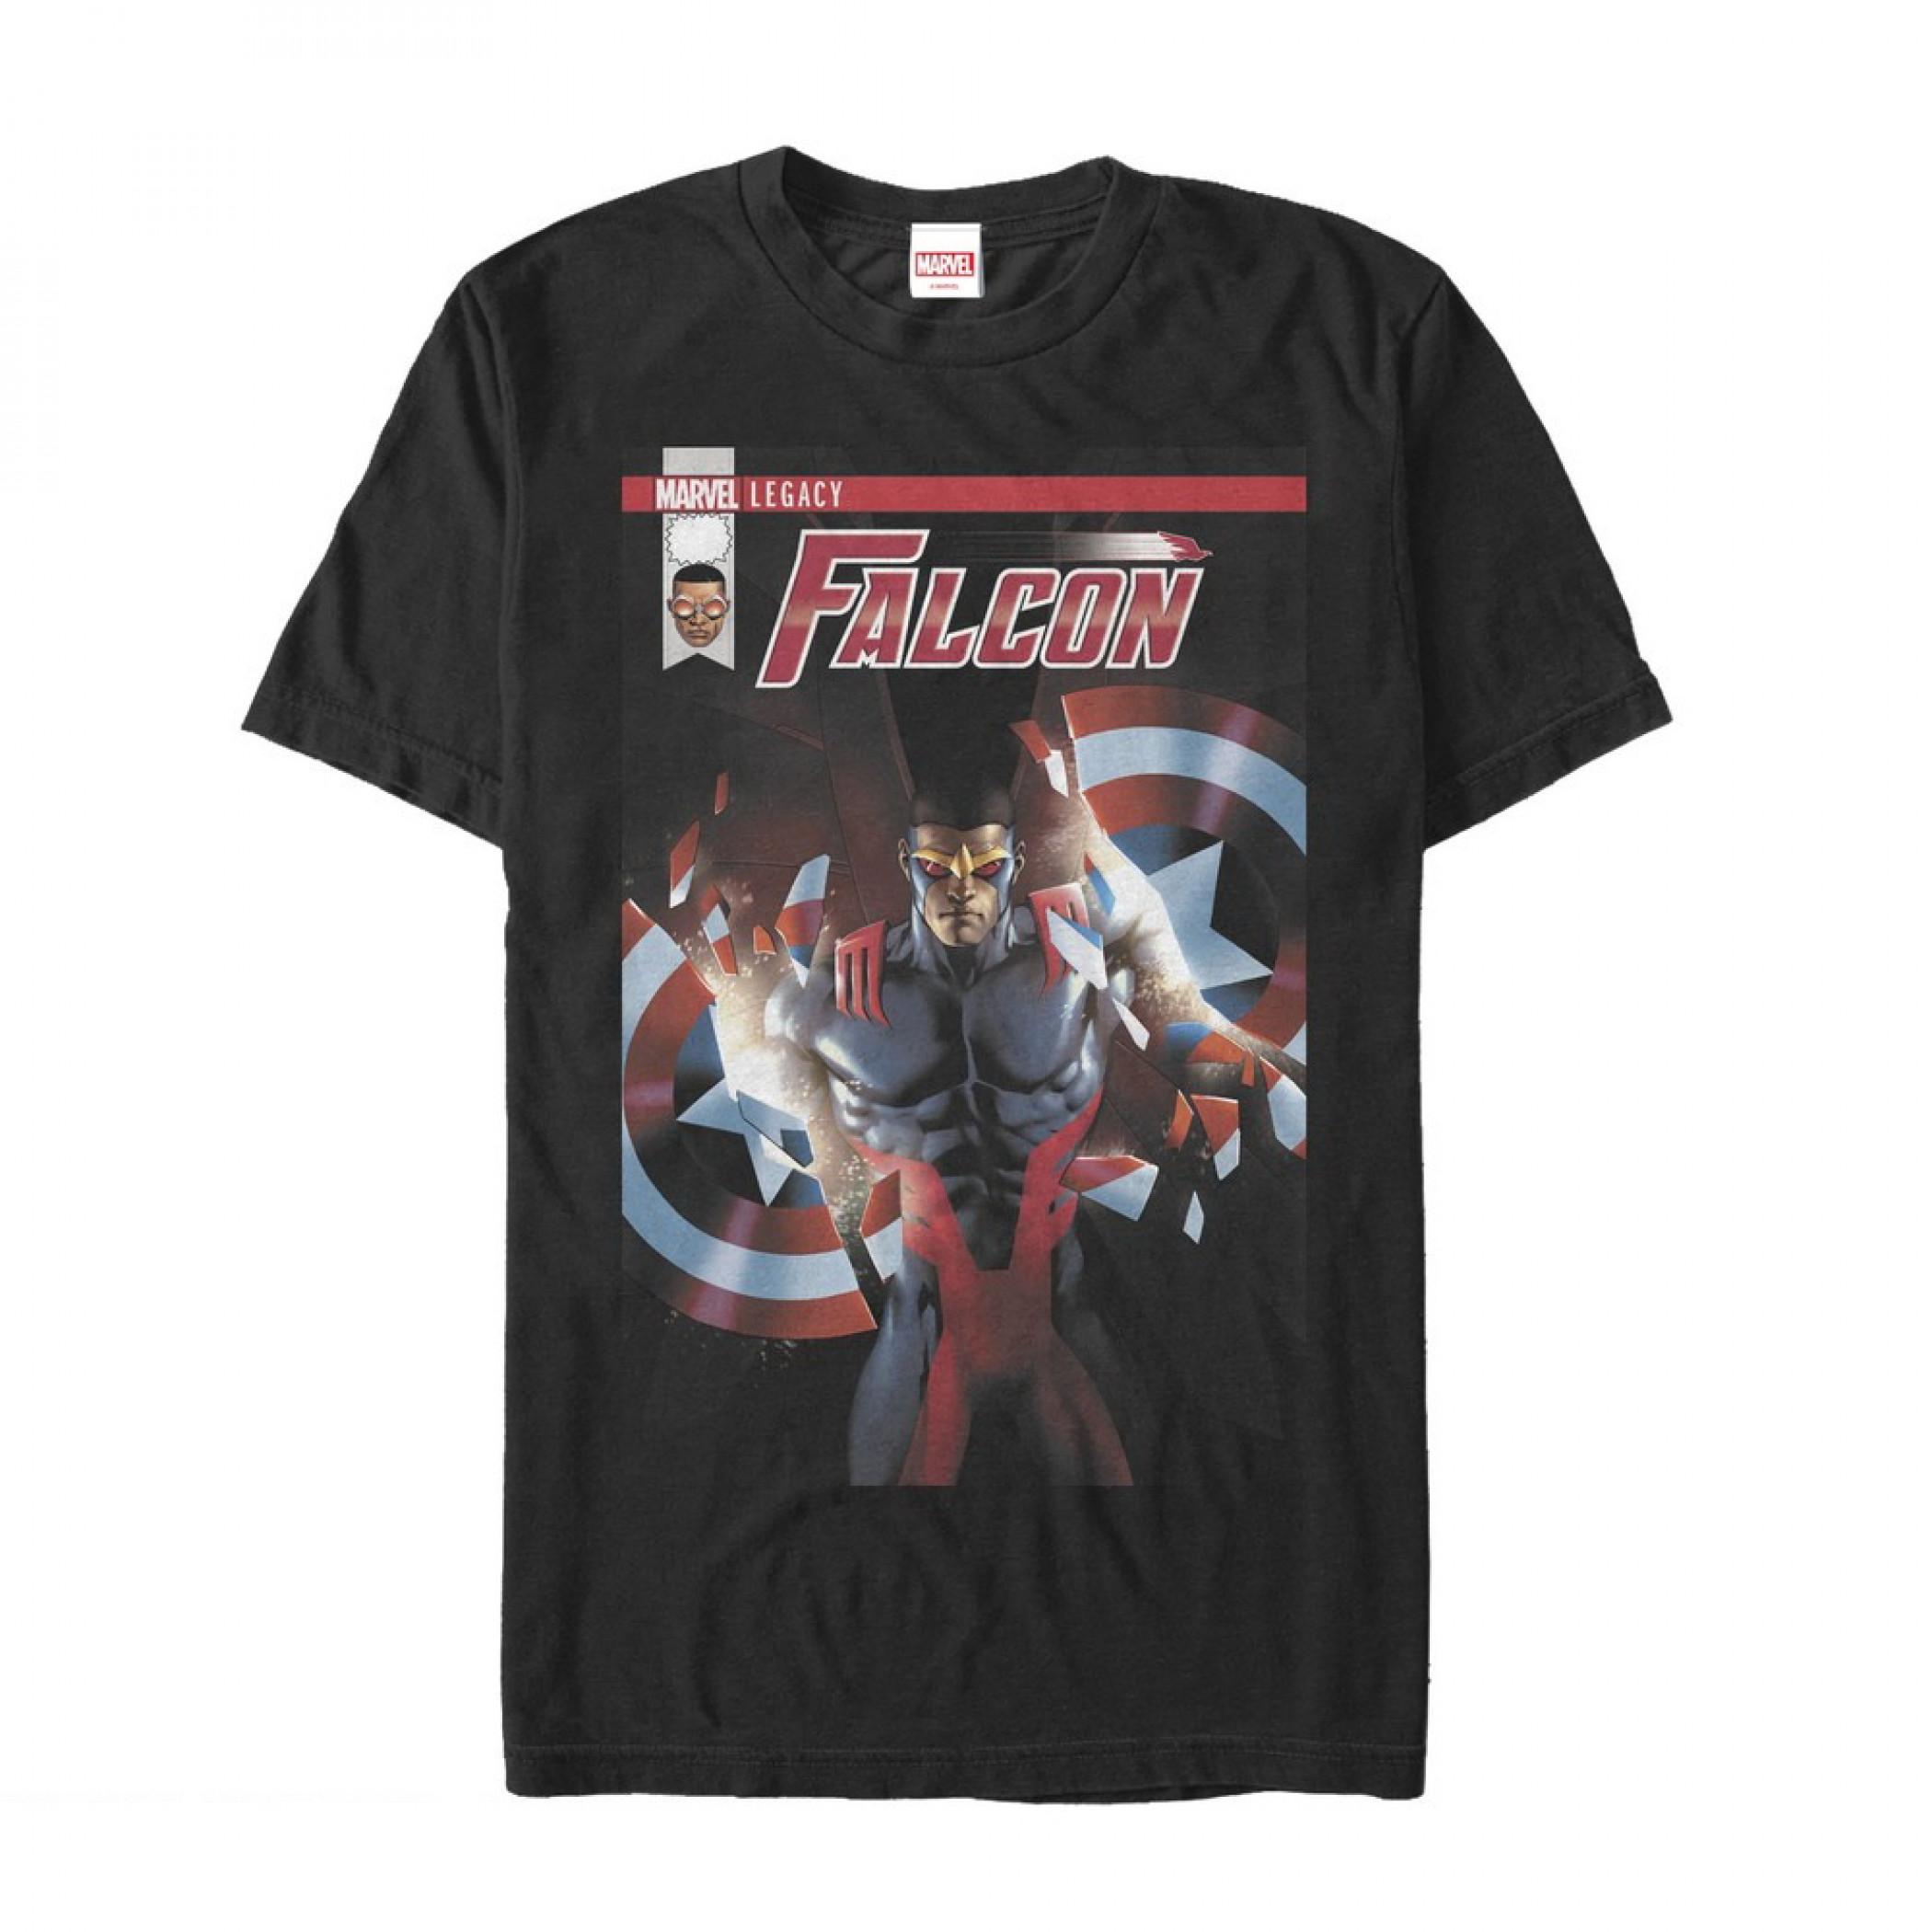 Falcon #1 Take Flight T-Shirt